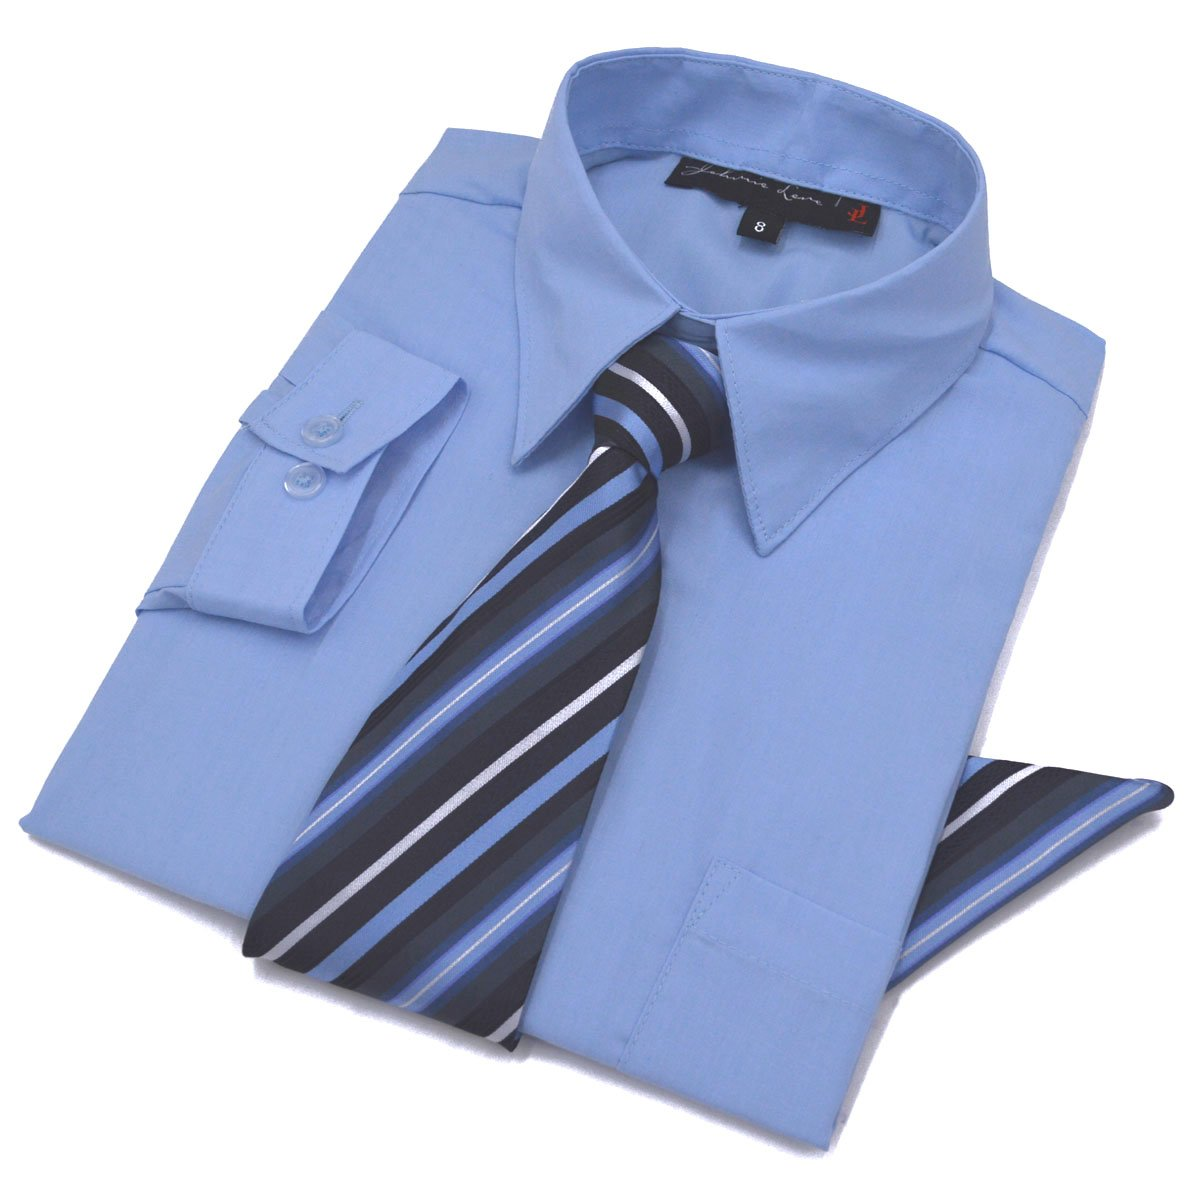 Boys Dress Shirt with Tie and Handkerchief #JL26 (14, Sky Blue)